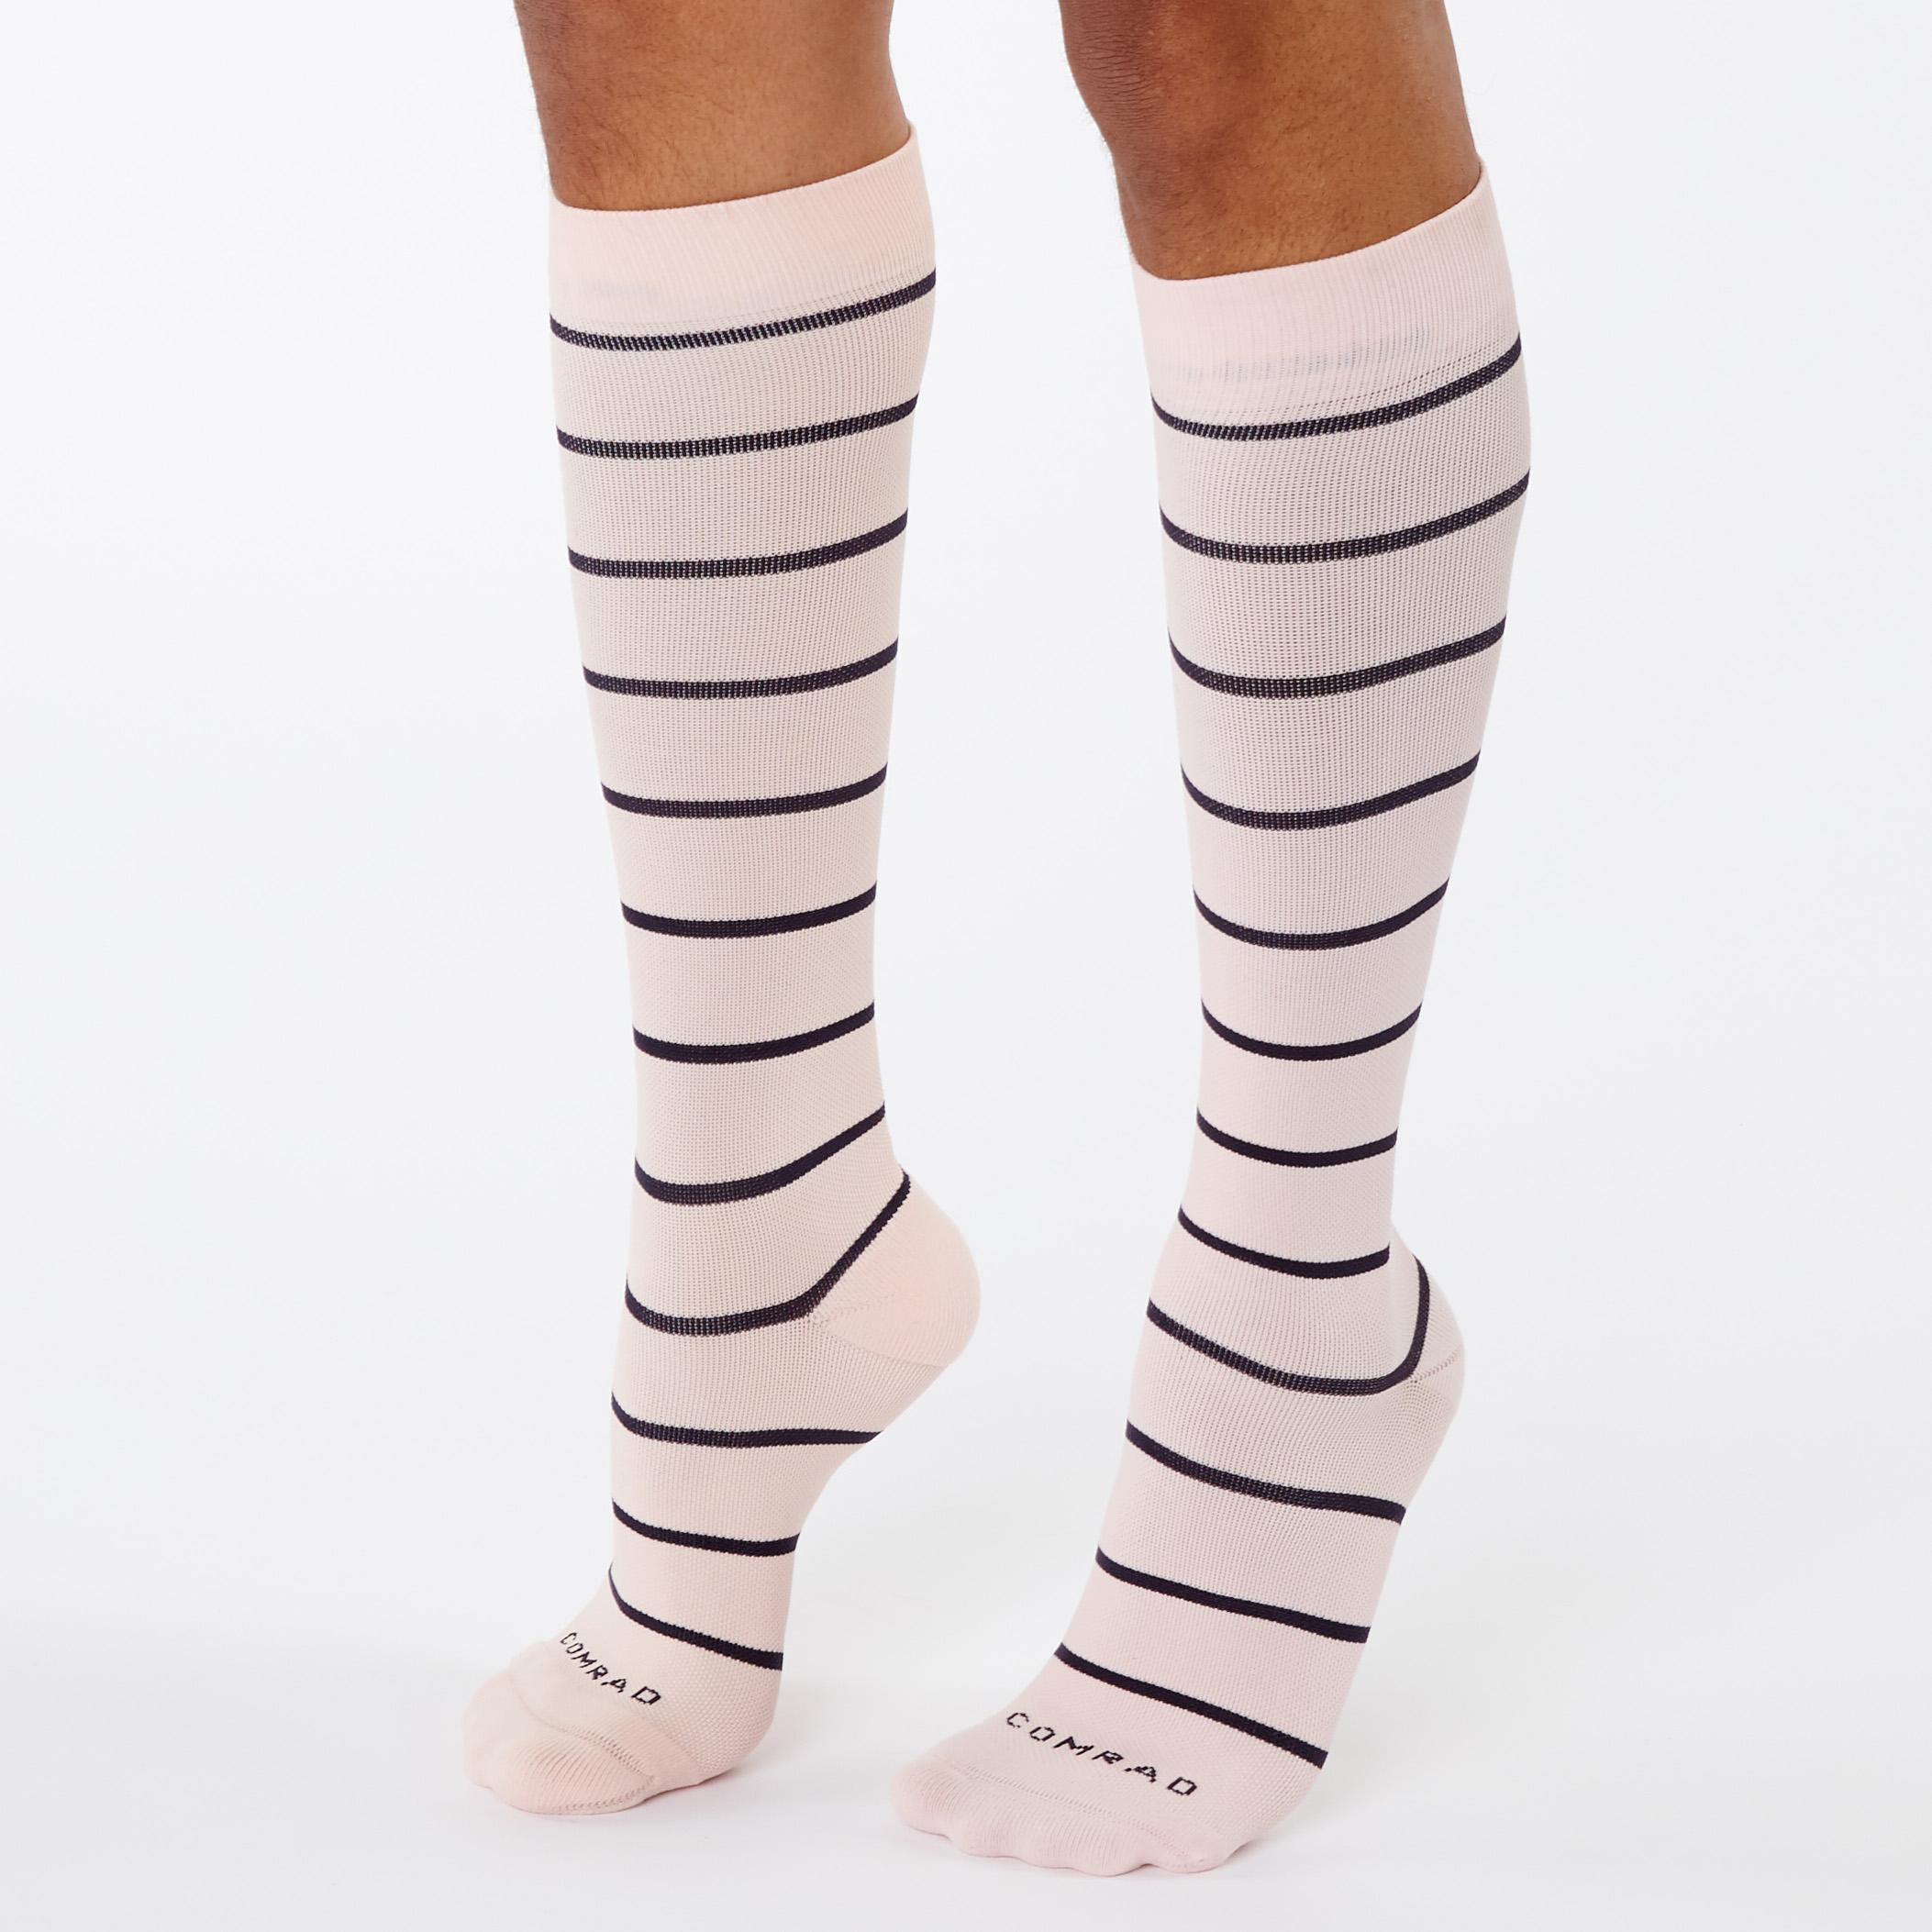 Dressing stylish for mens